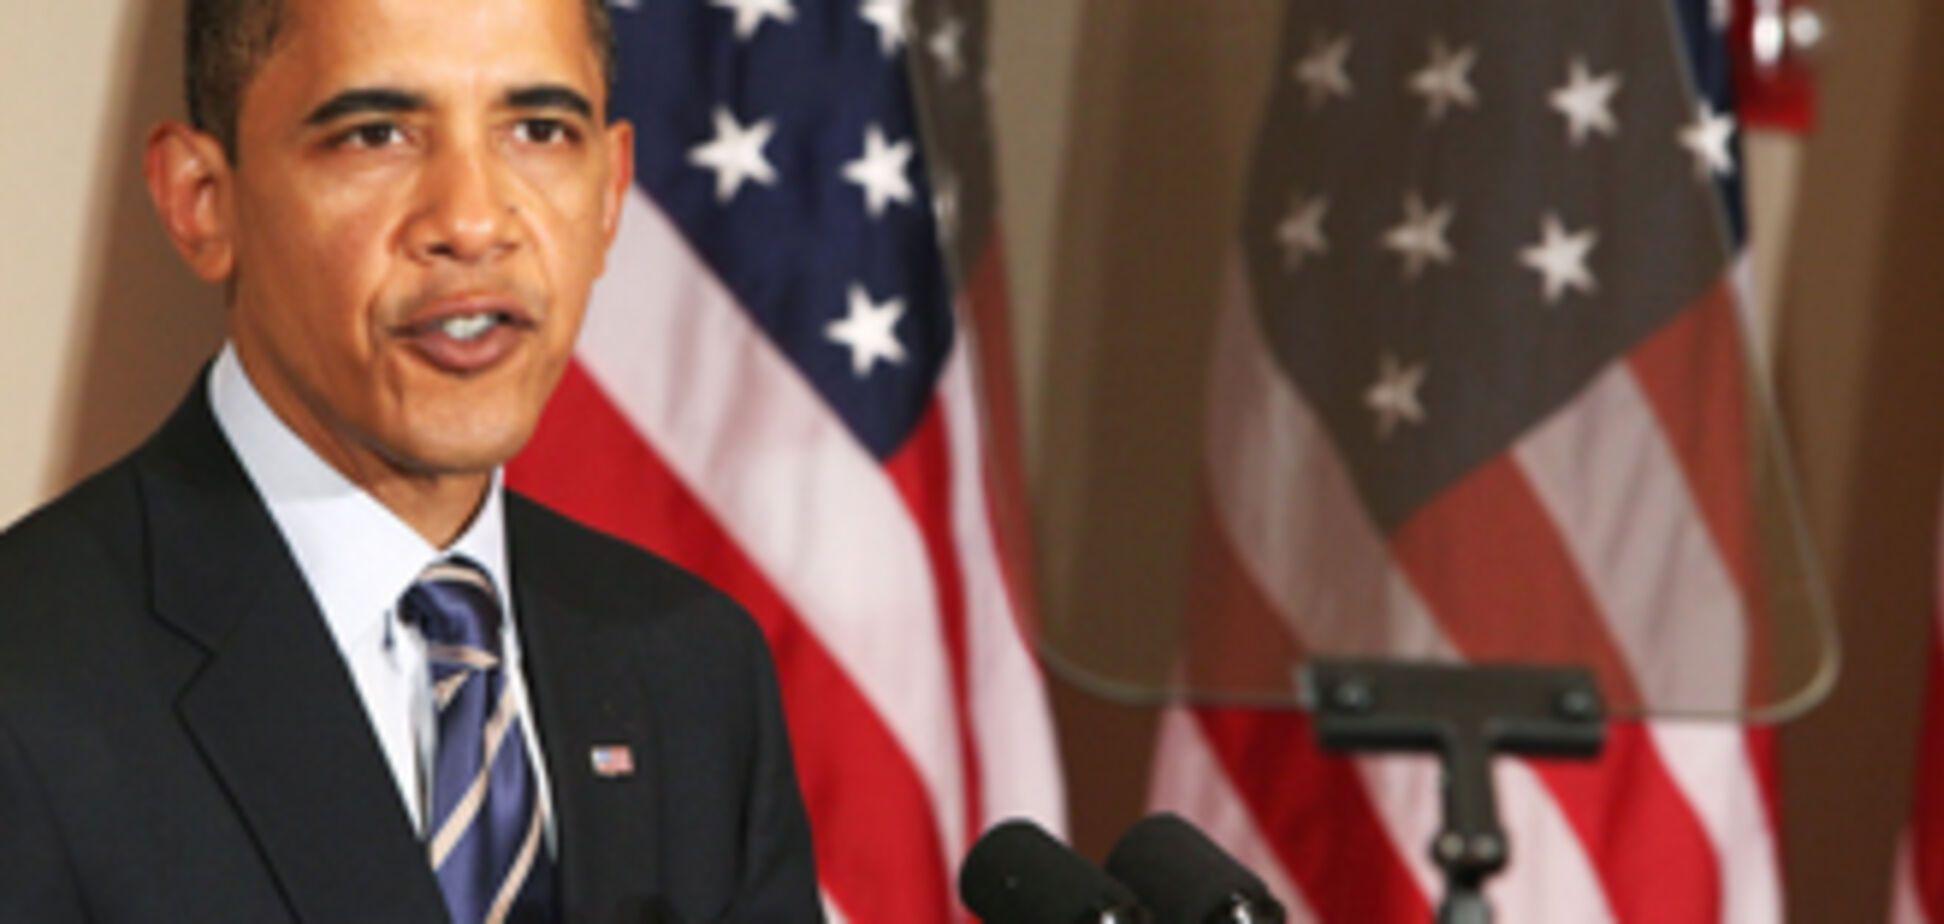 Обама-народу: 'О, боже мій'